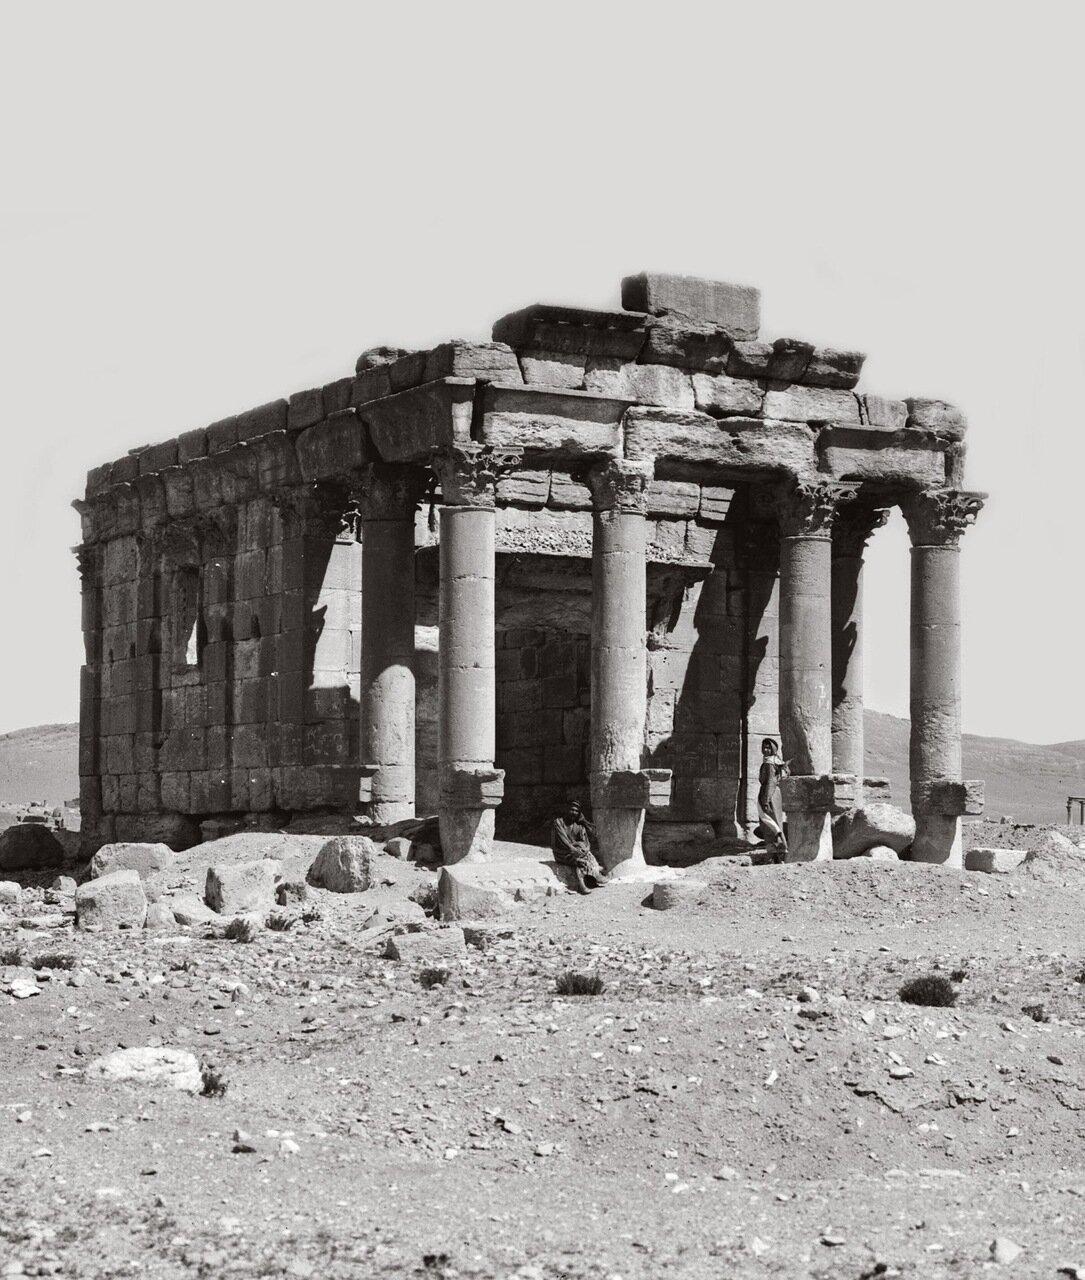 Хорошо сохранившийся храм матери царя. Пальмира. Тадмор, Сирия. 1900-1920 гг.